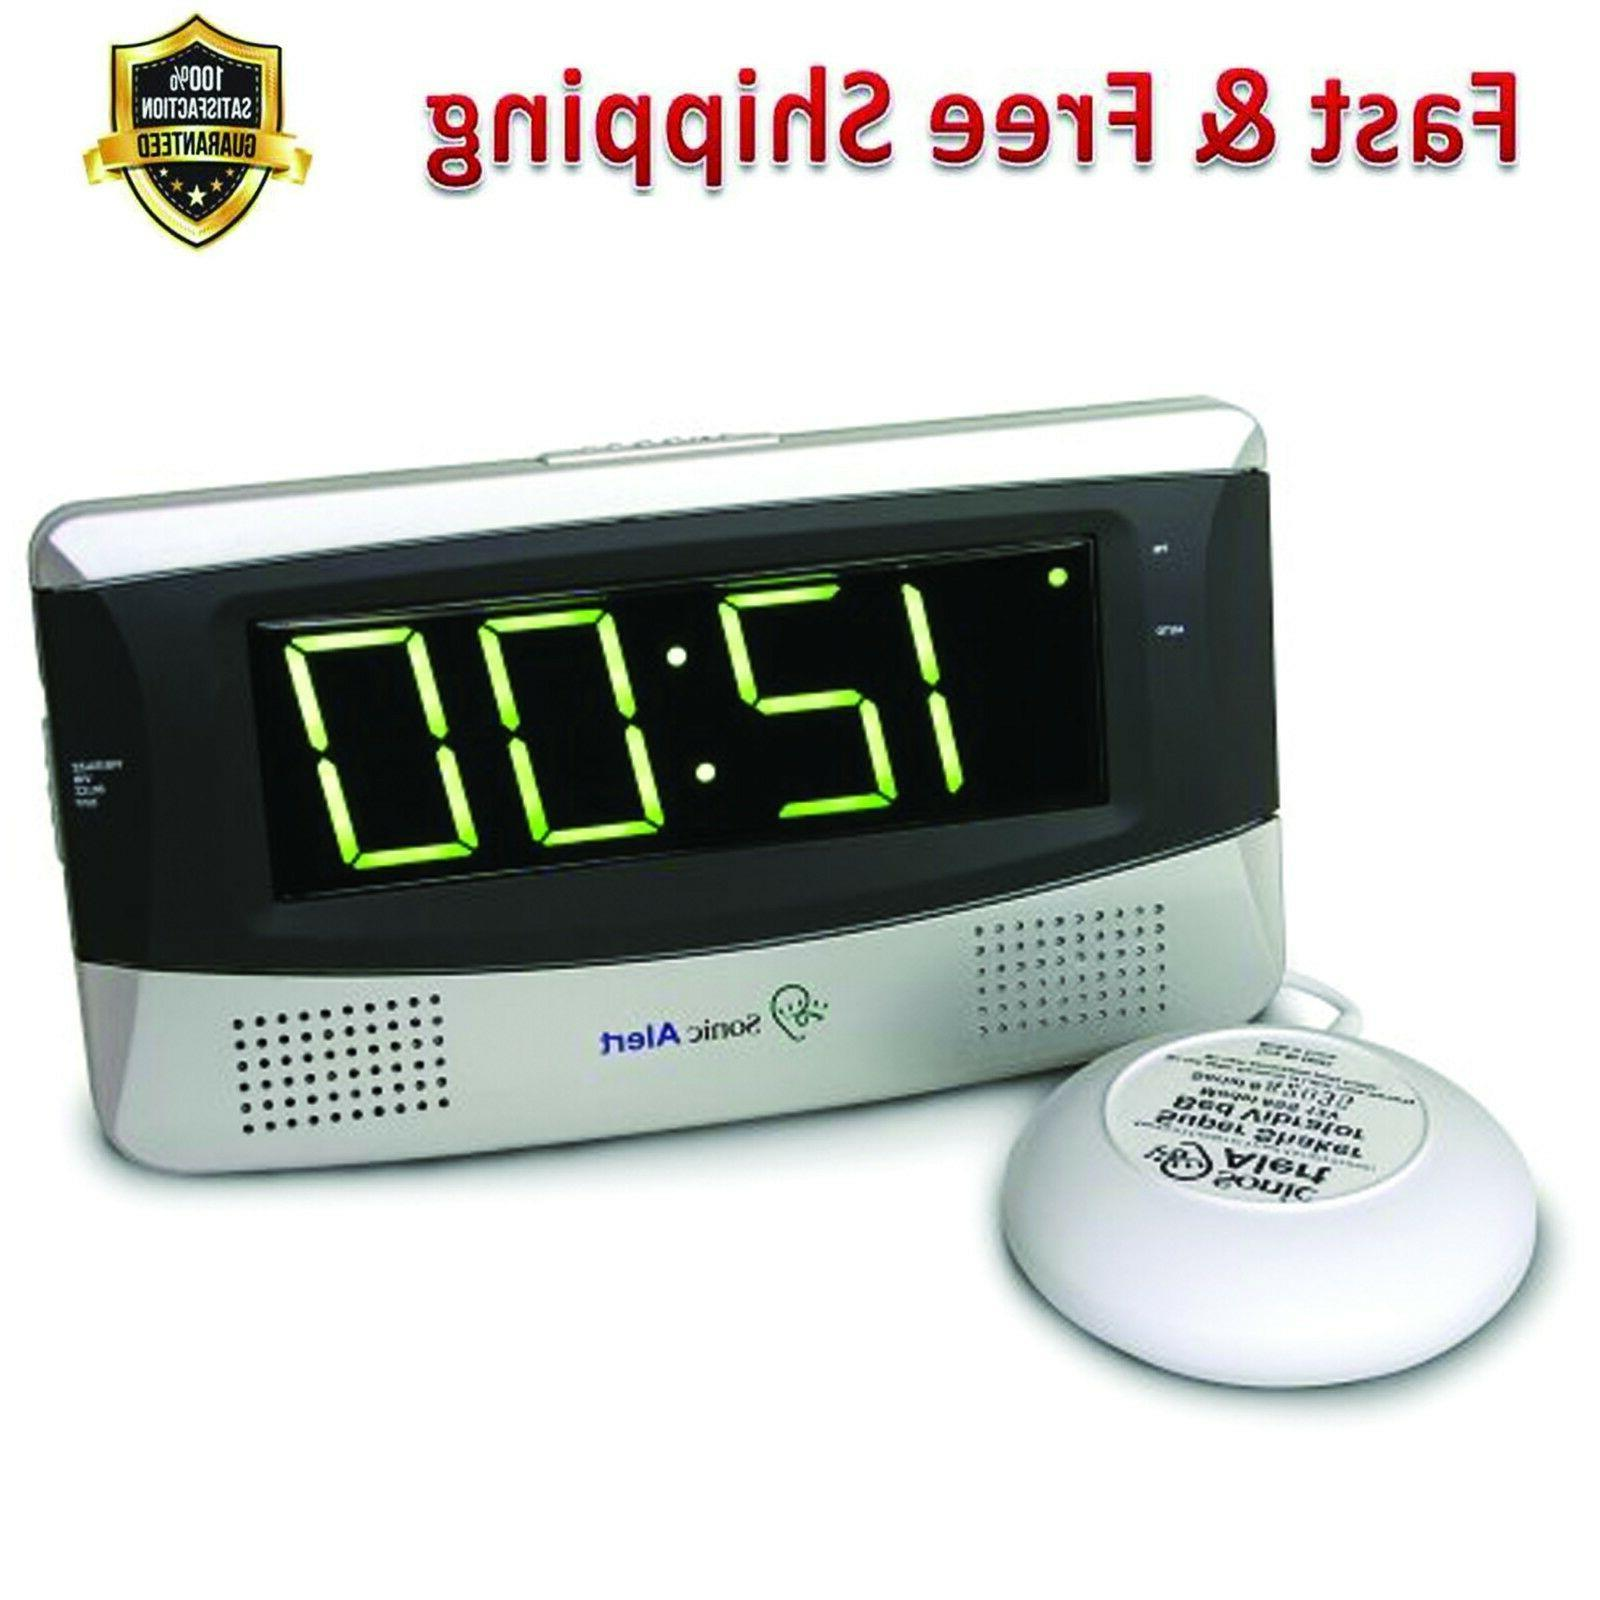 alarm clock sonic boom loud vibrating large